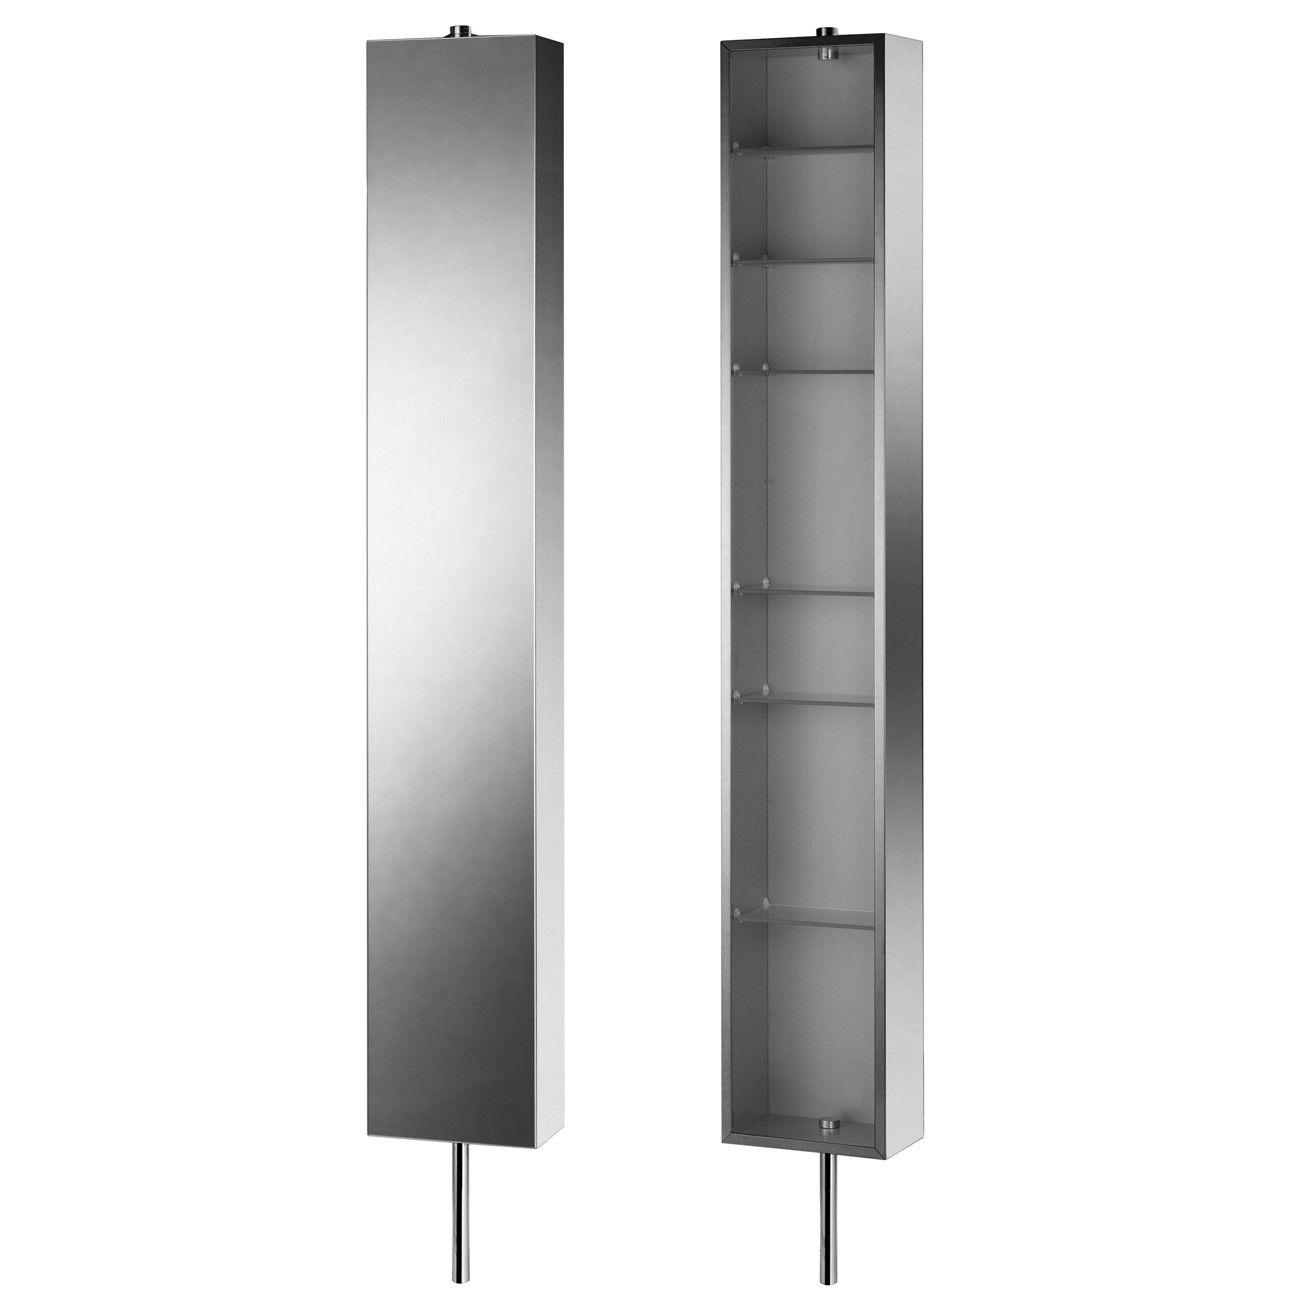 white mirrored bathroom cabinets uk teak ampquot ampquot from ...